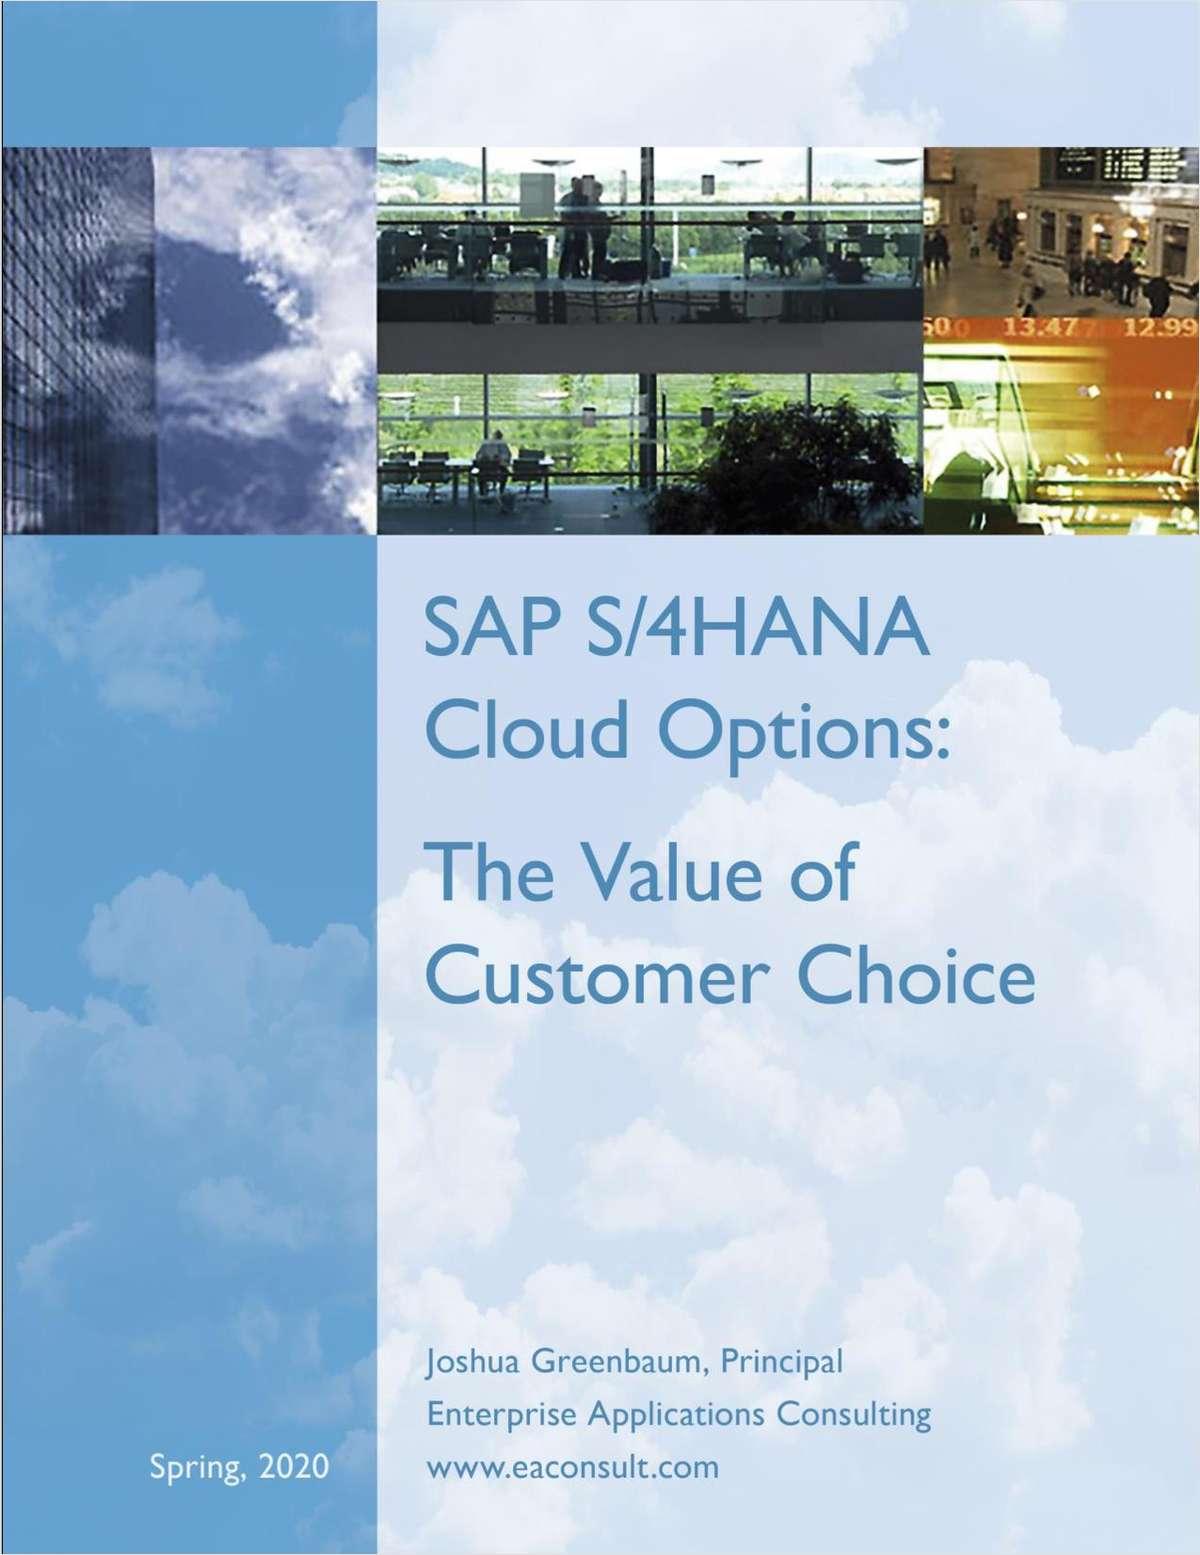 SAP's S/4HANA Cloud Options: The Value of Customer Choice